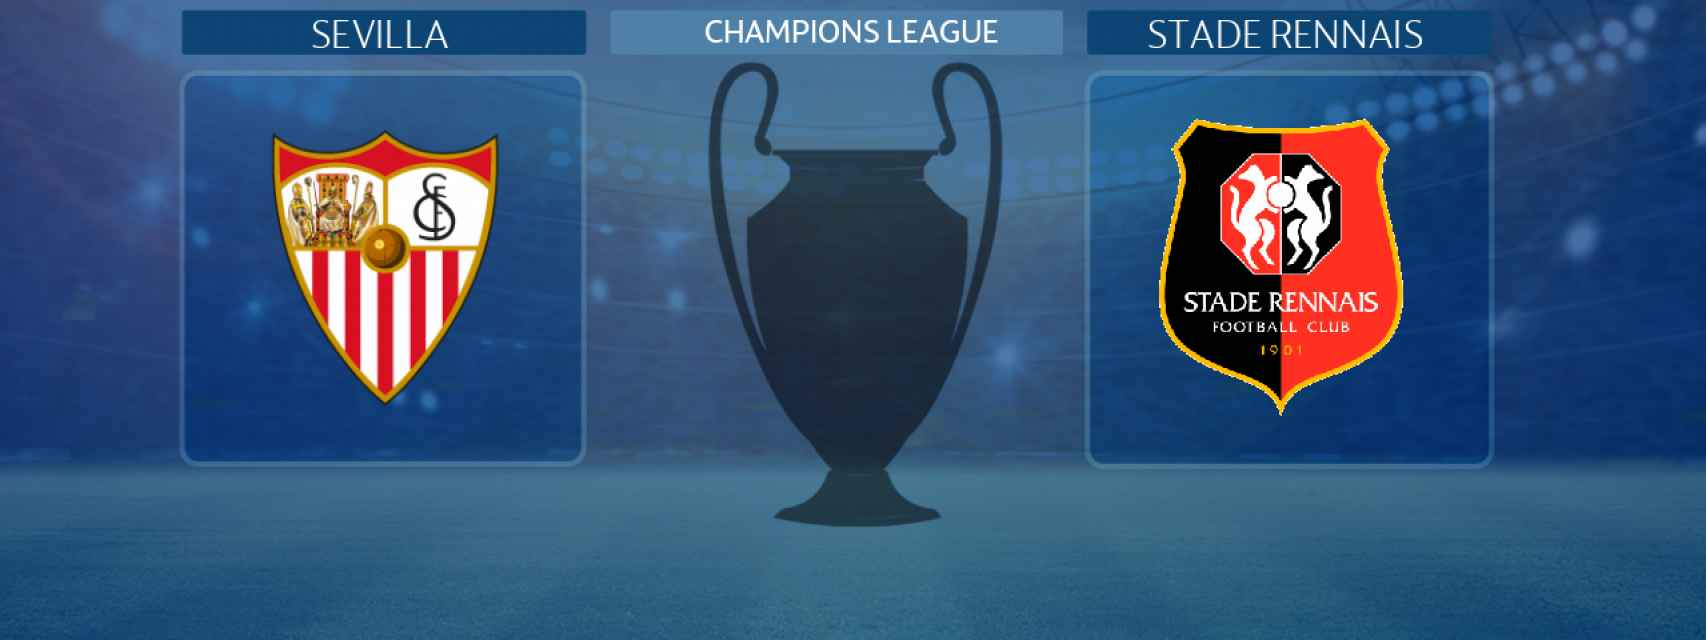 Sevilla - Stade Rennais, partido de la Champions League